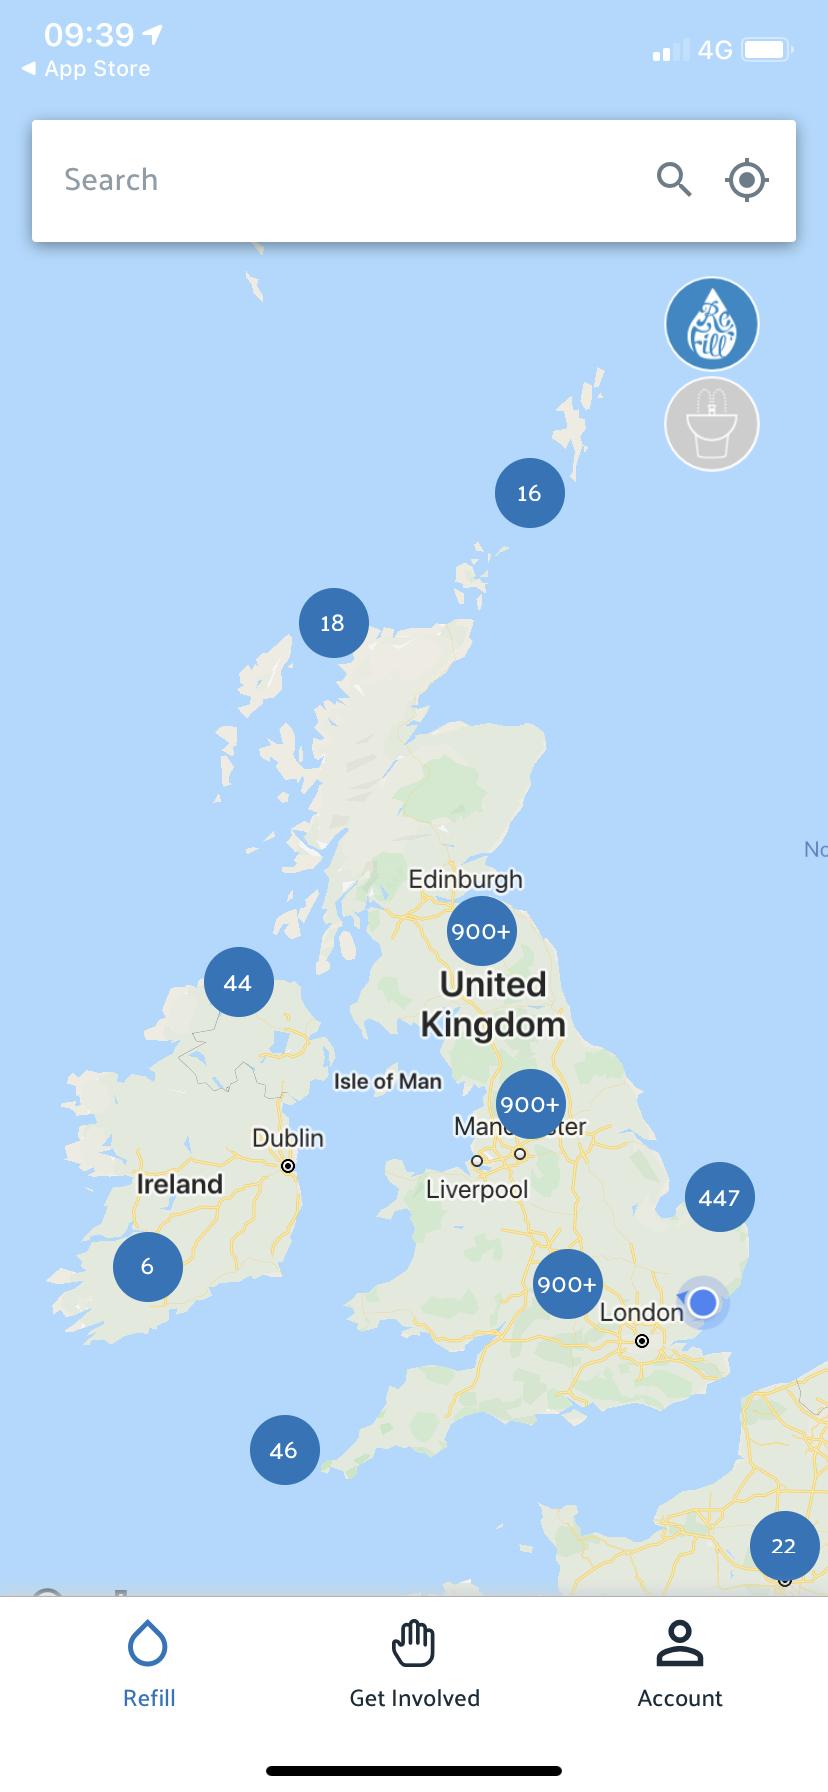 Refill Stations UK